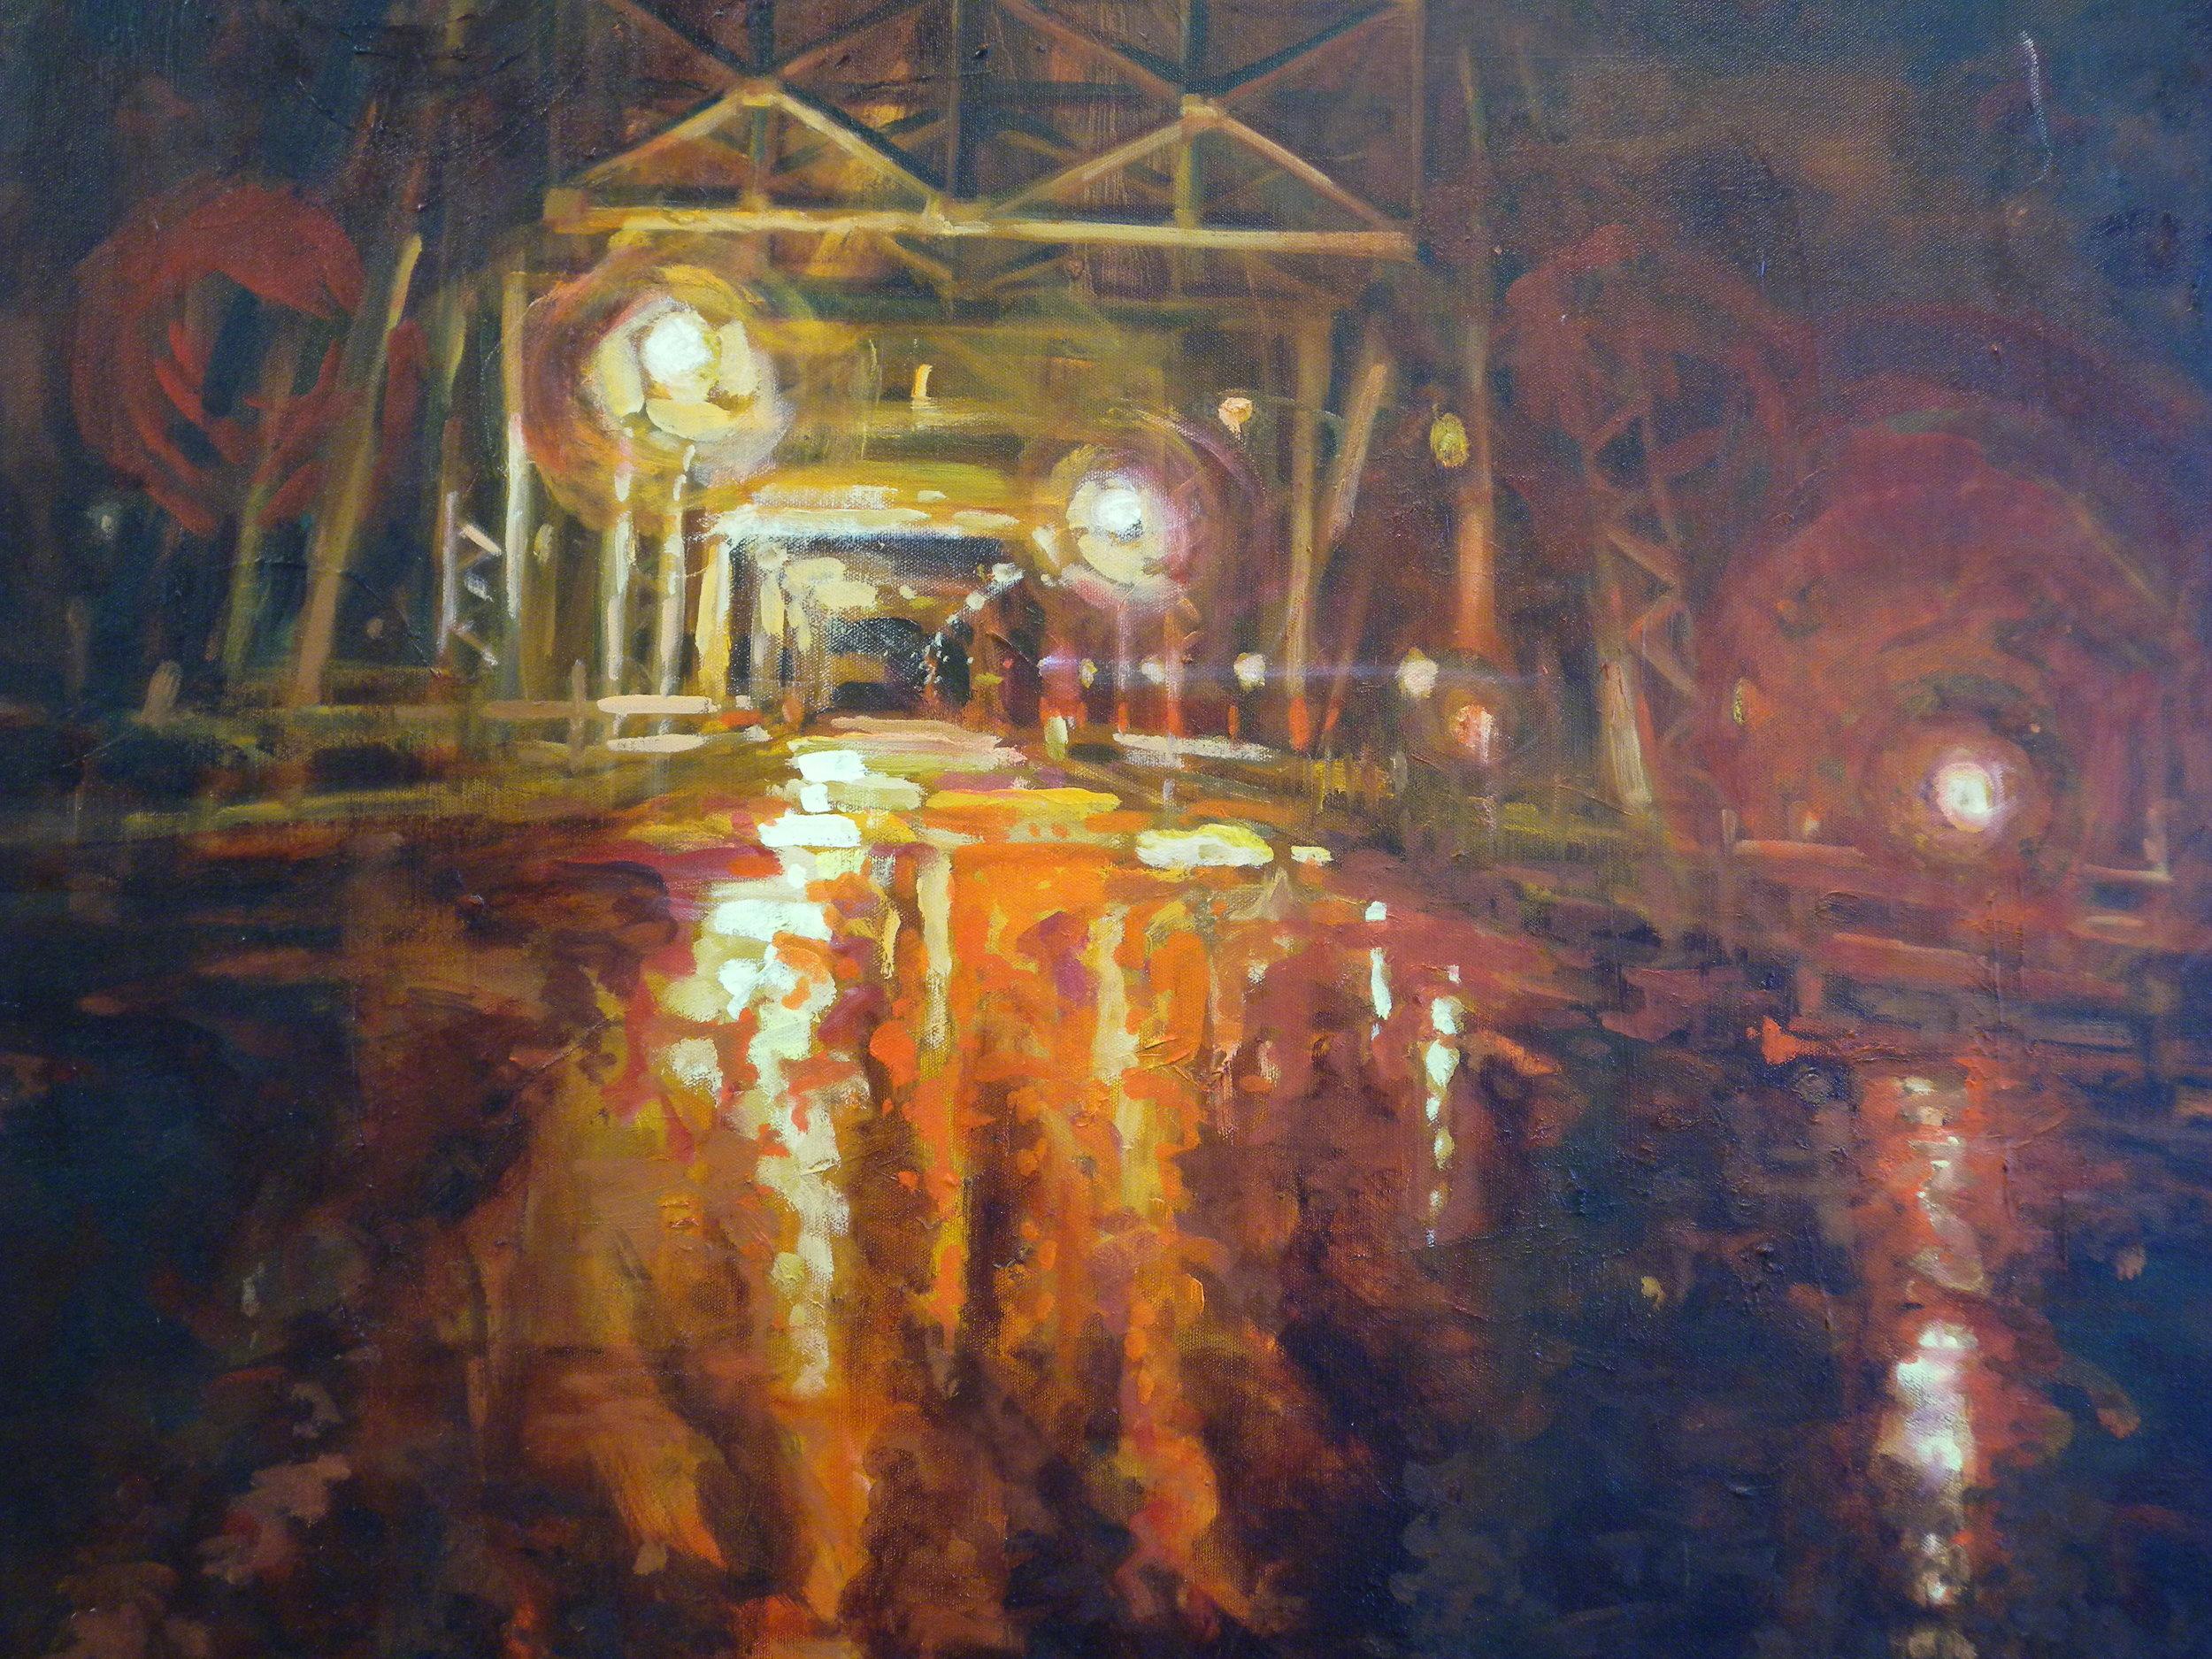 Tim's Crossing, oils, 16 x 20